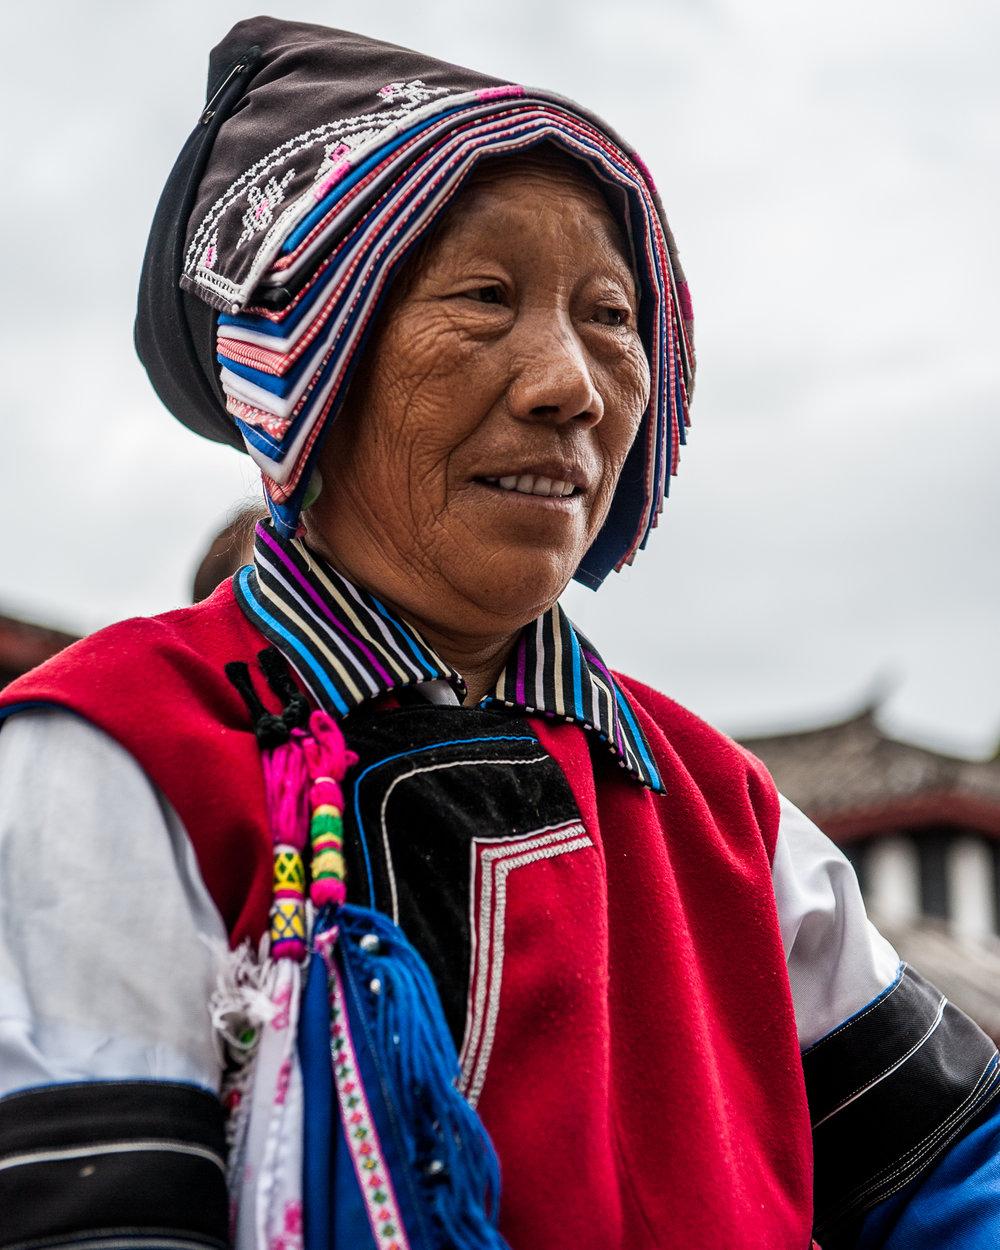 Bai Woman